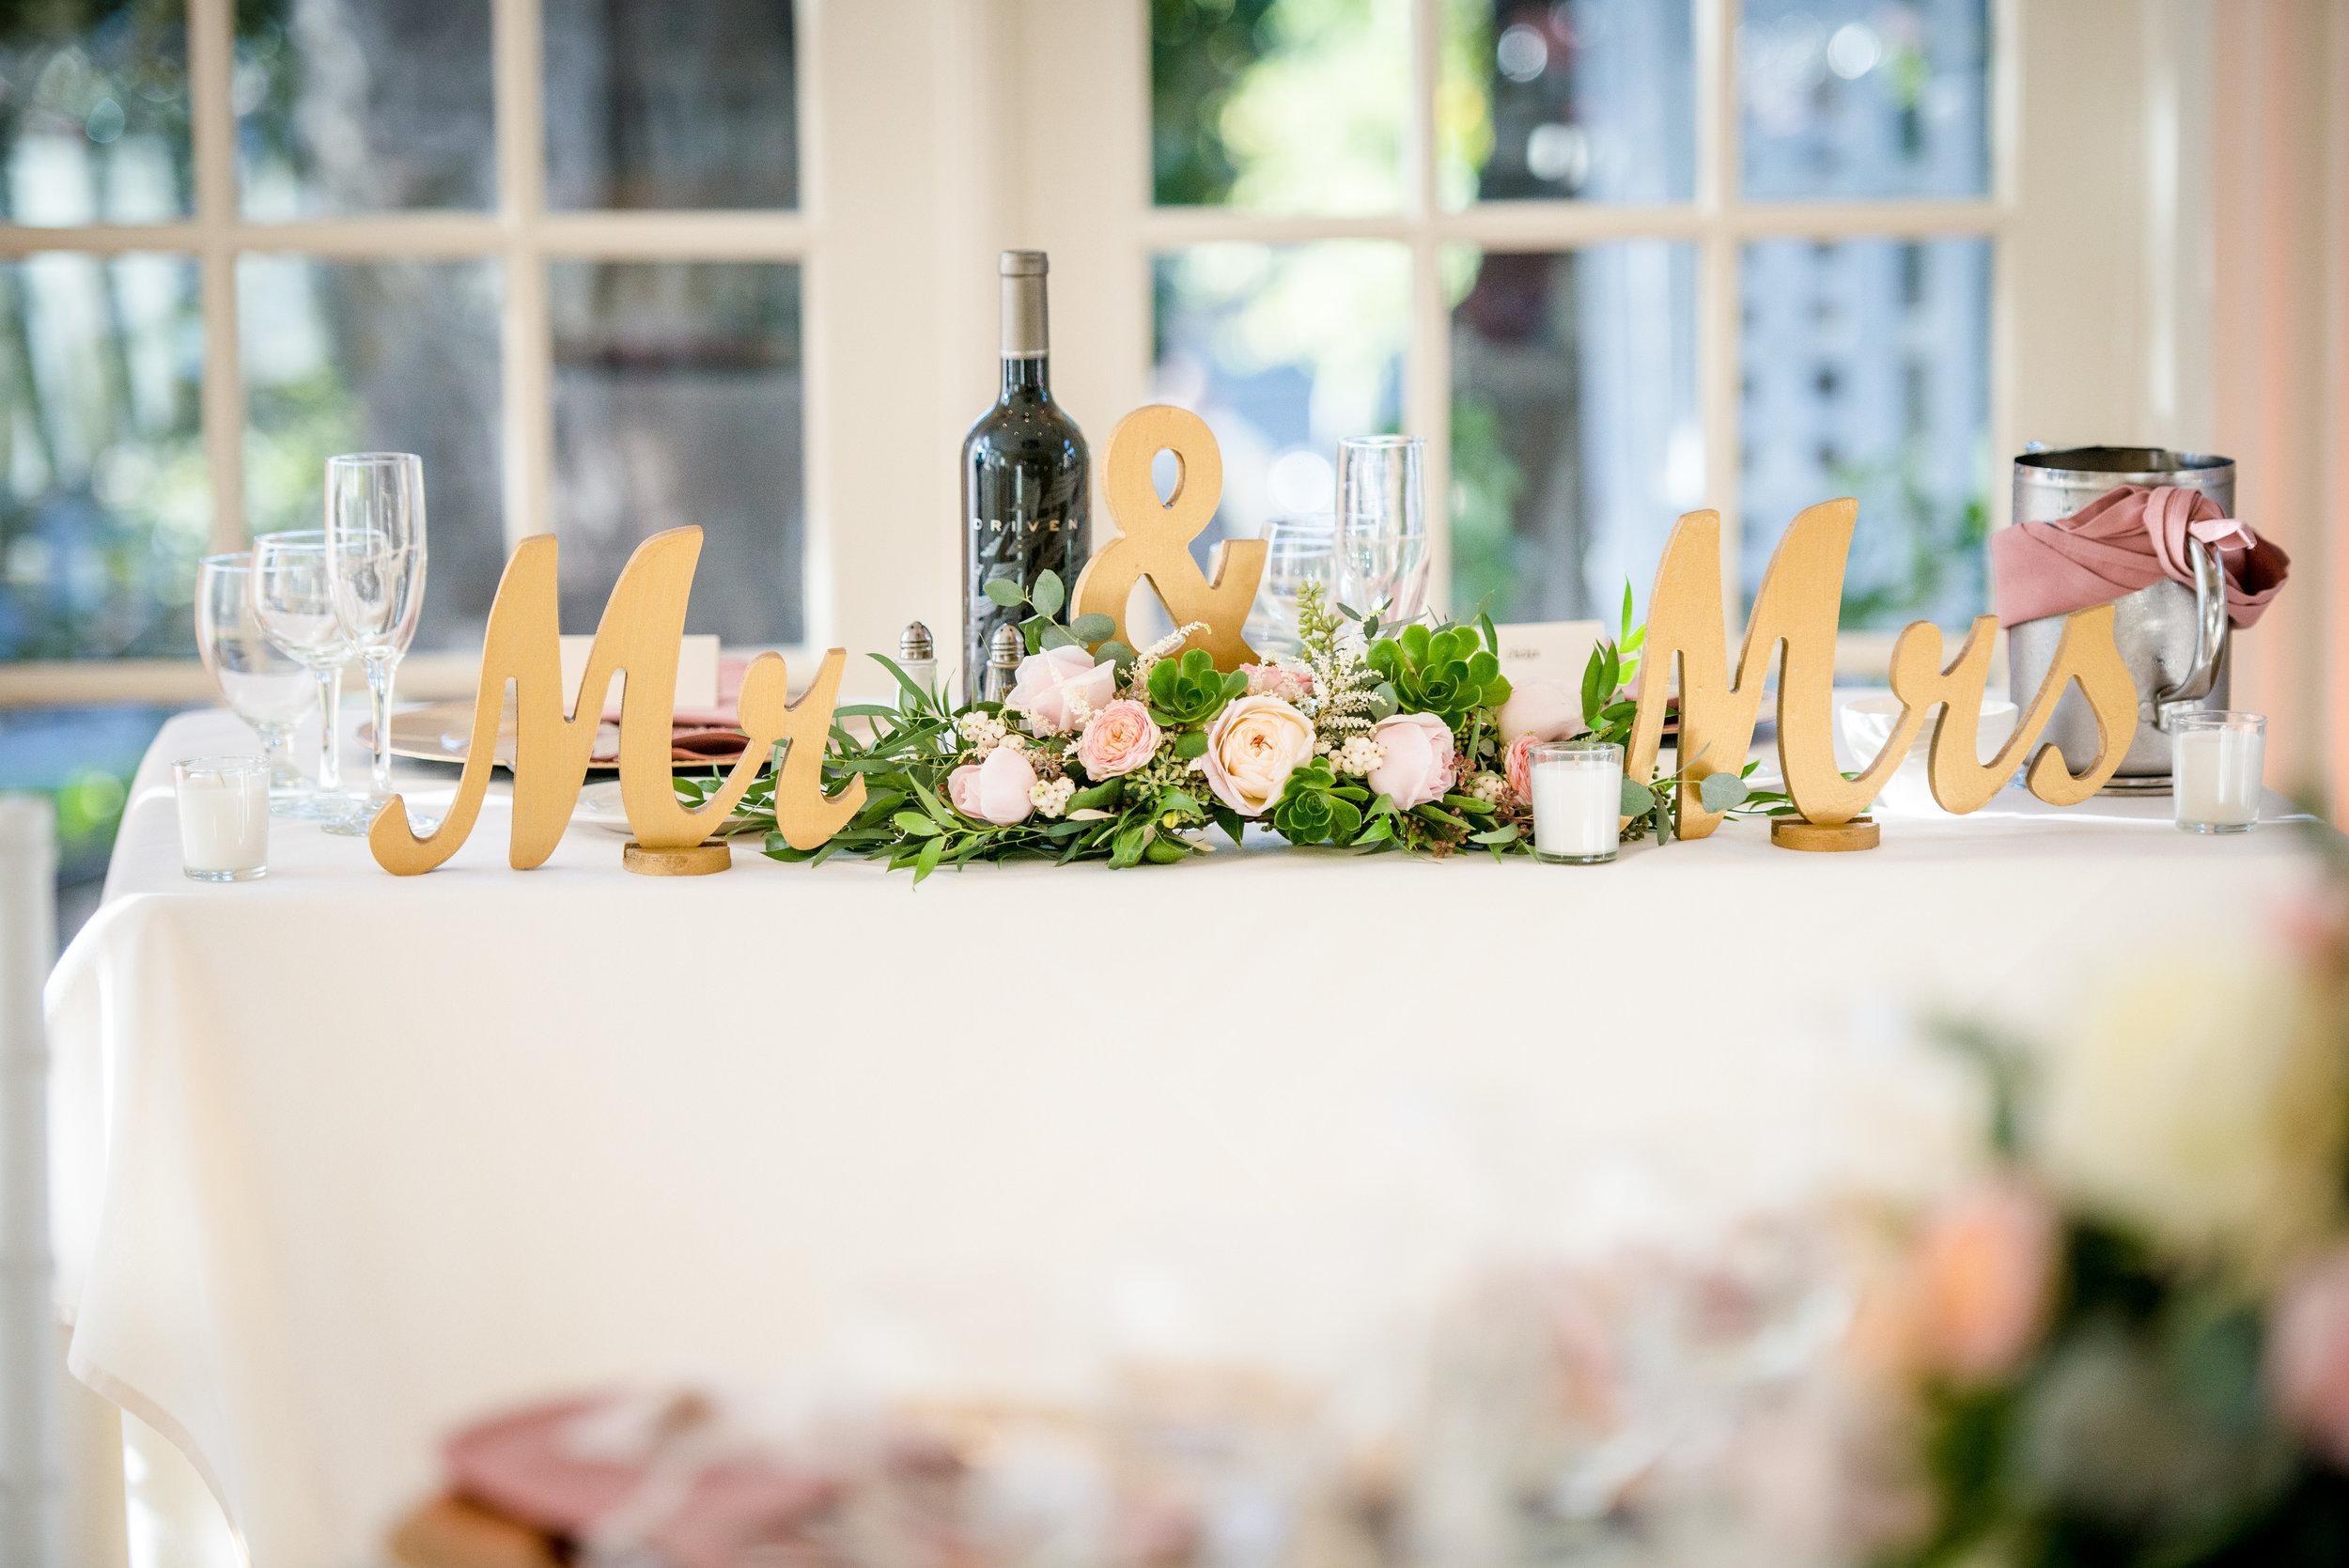 Sweetheart_Table_Mr_Mrs_Head_Centerpiece_Vizcaya_Sacramento_Violette_Fleurs.jpg